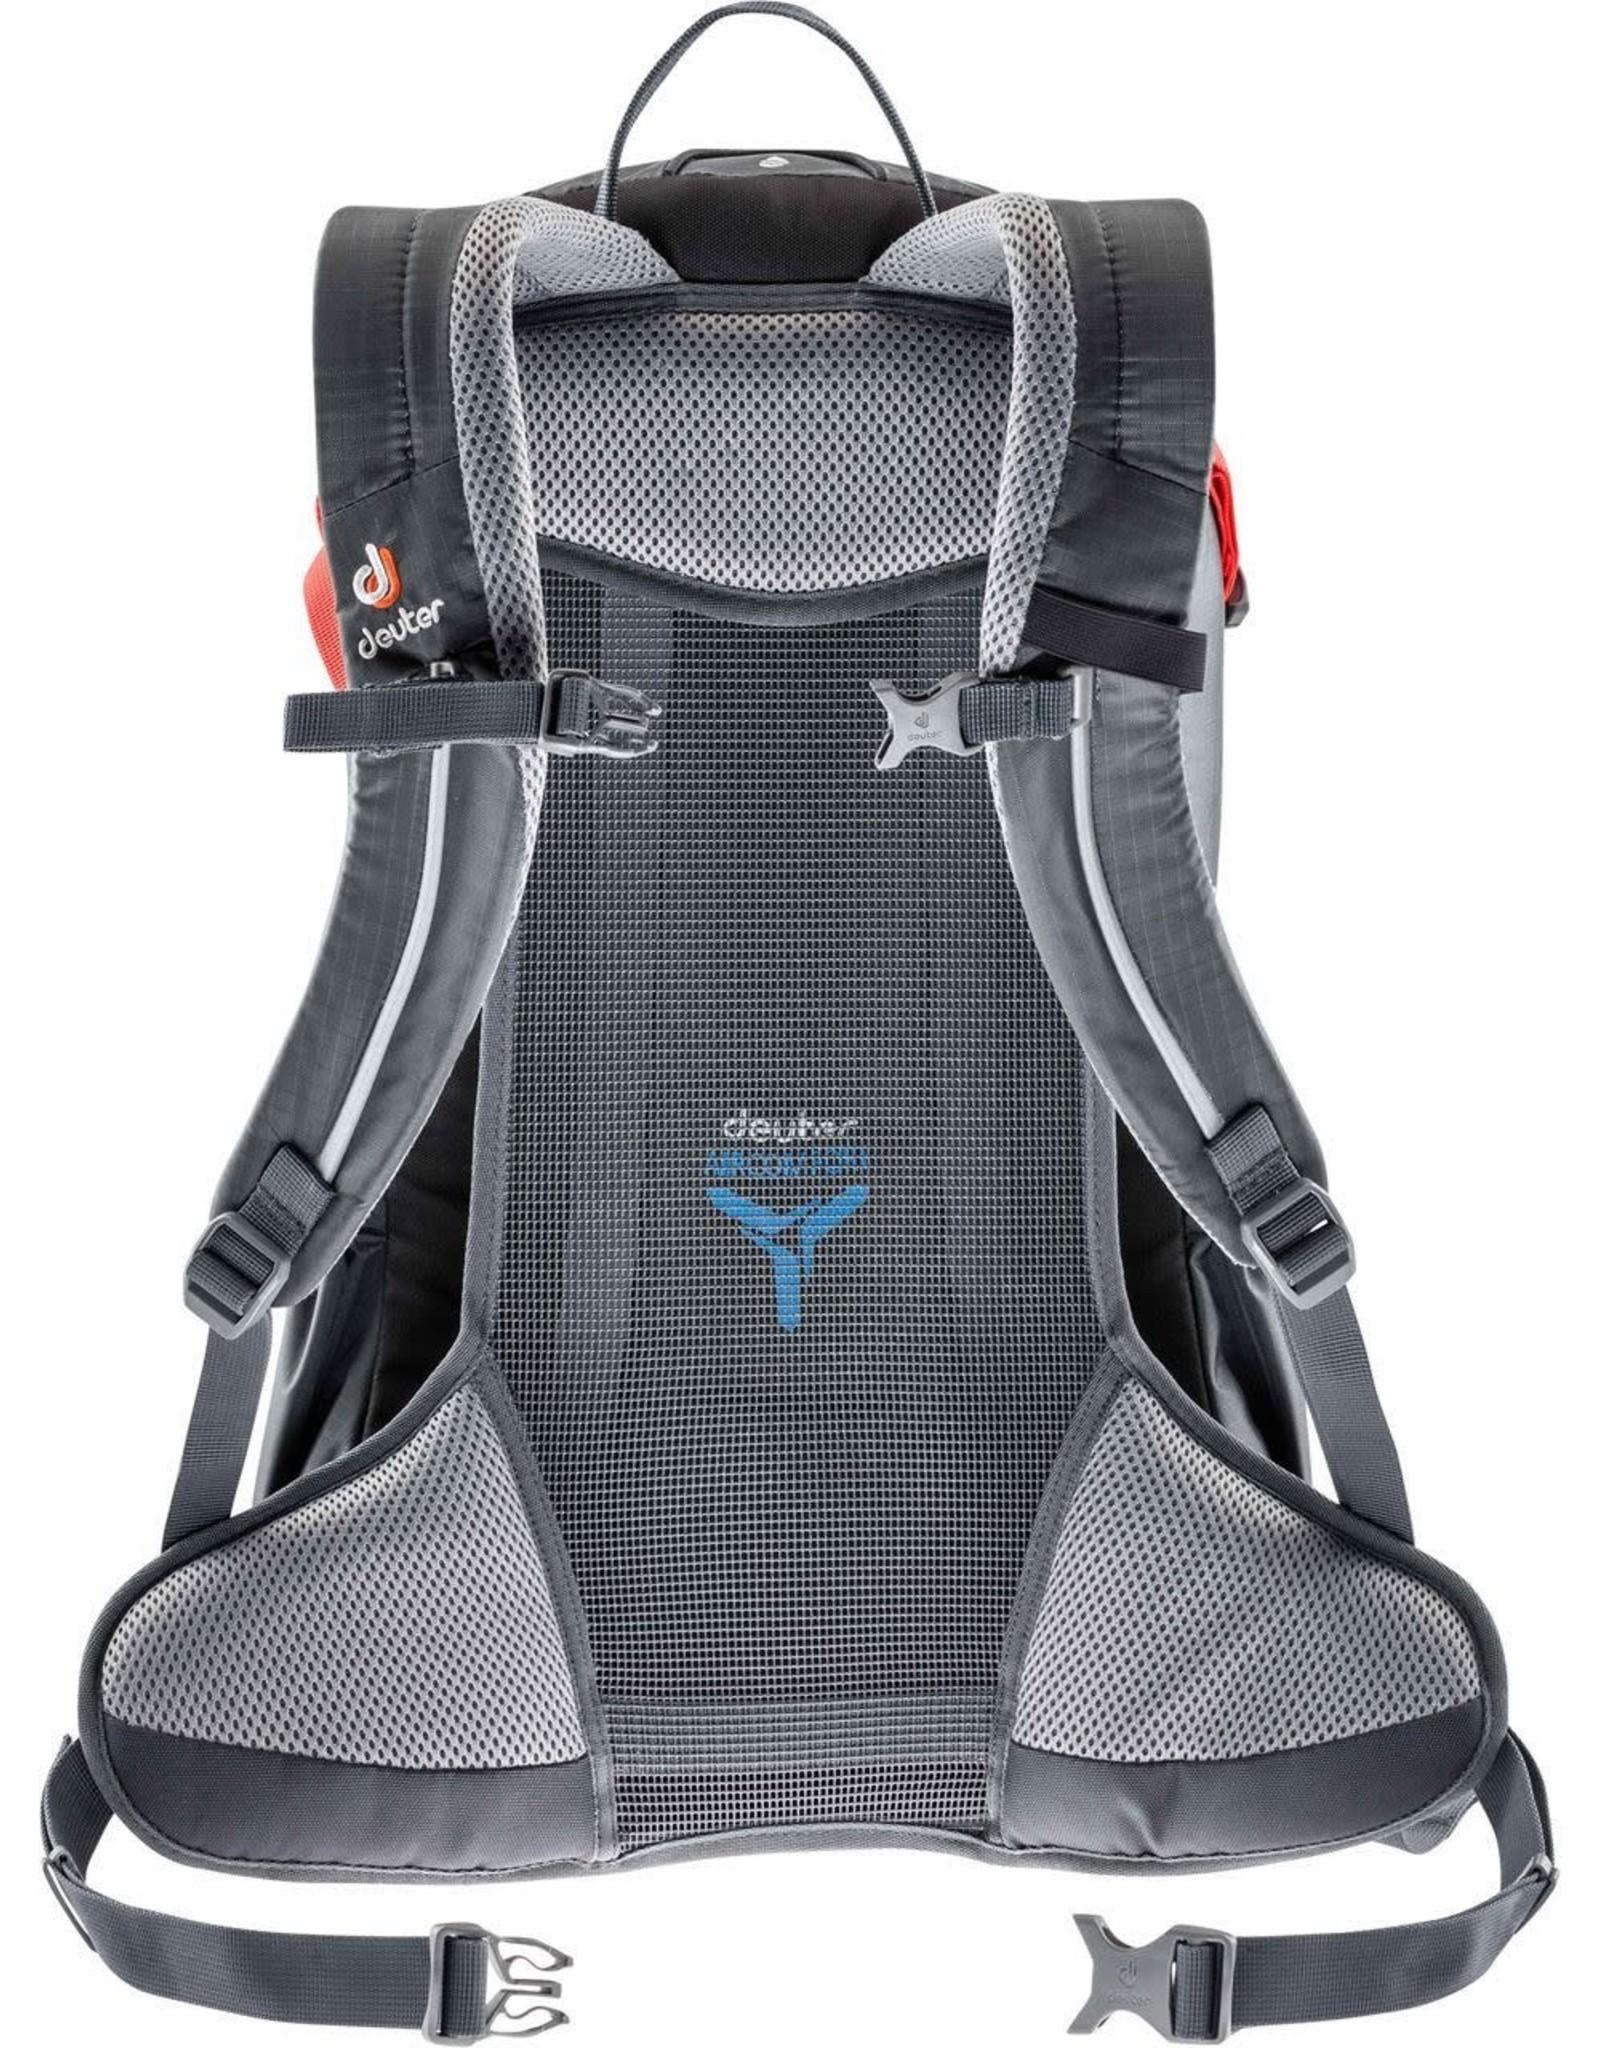 Deuter Packs VELO AIR 20 EXP BLACK TITAN